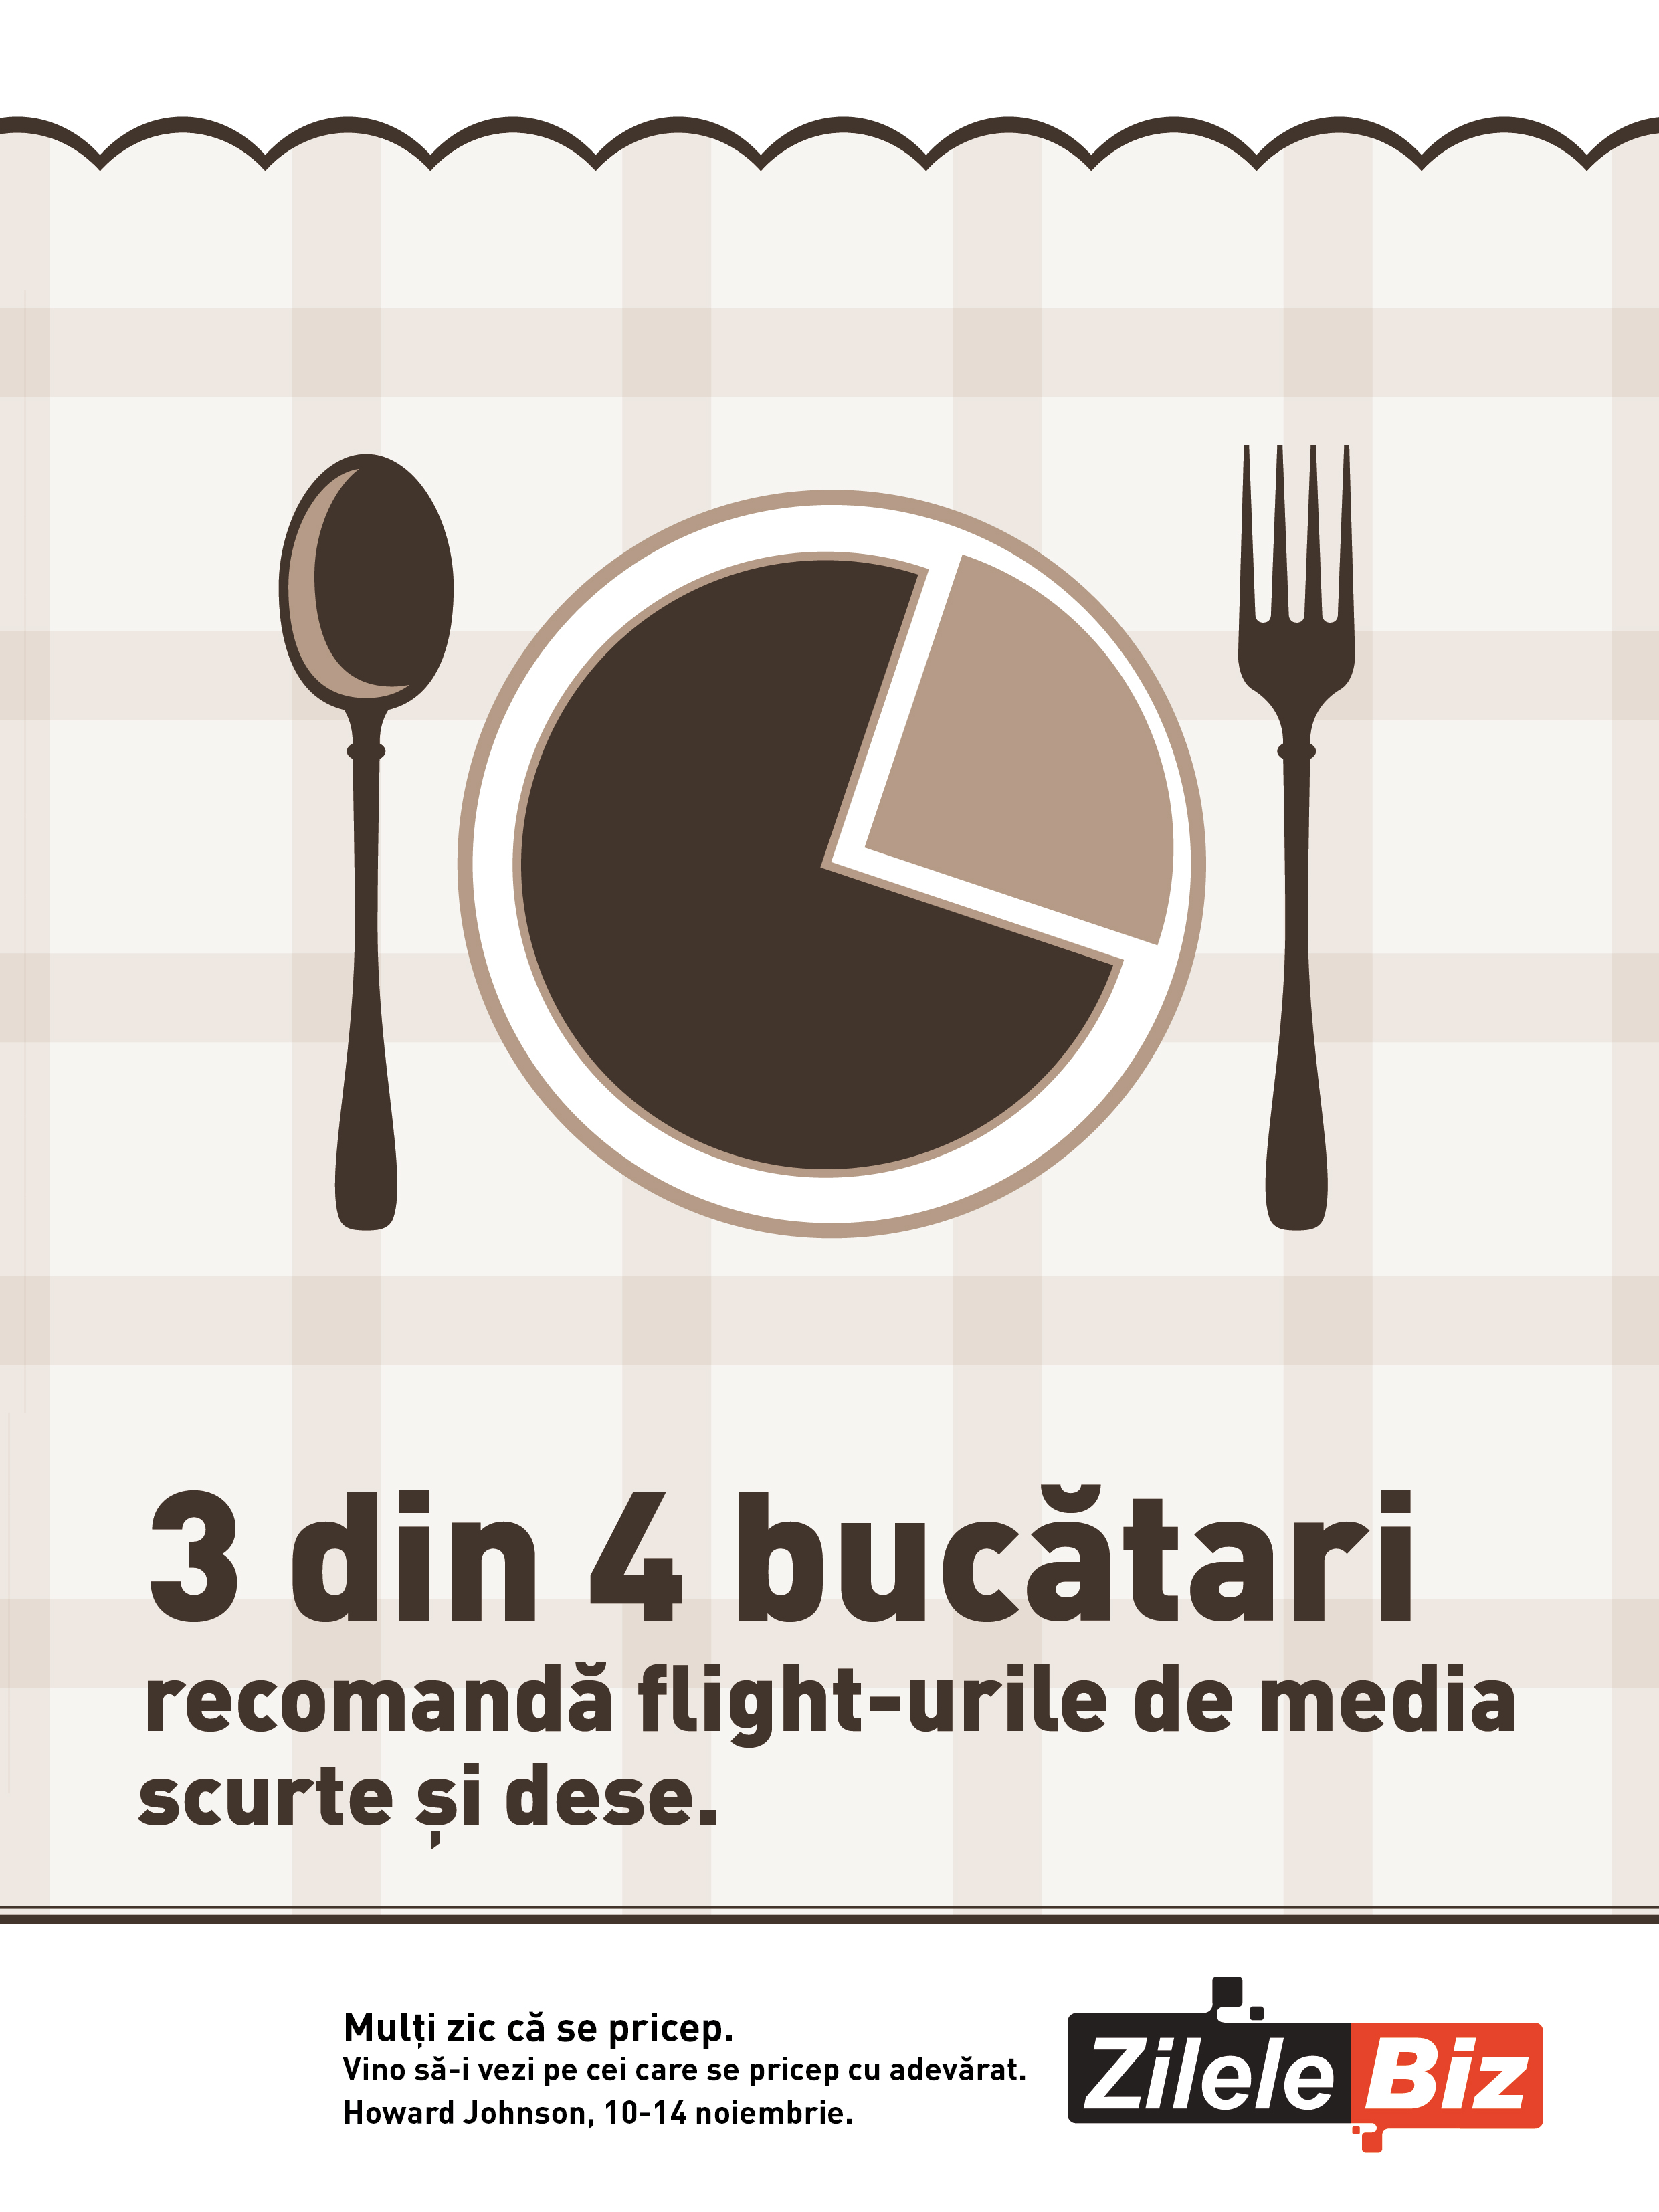 BIZ_210x280_Statistica_bucatari-01